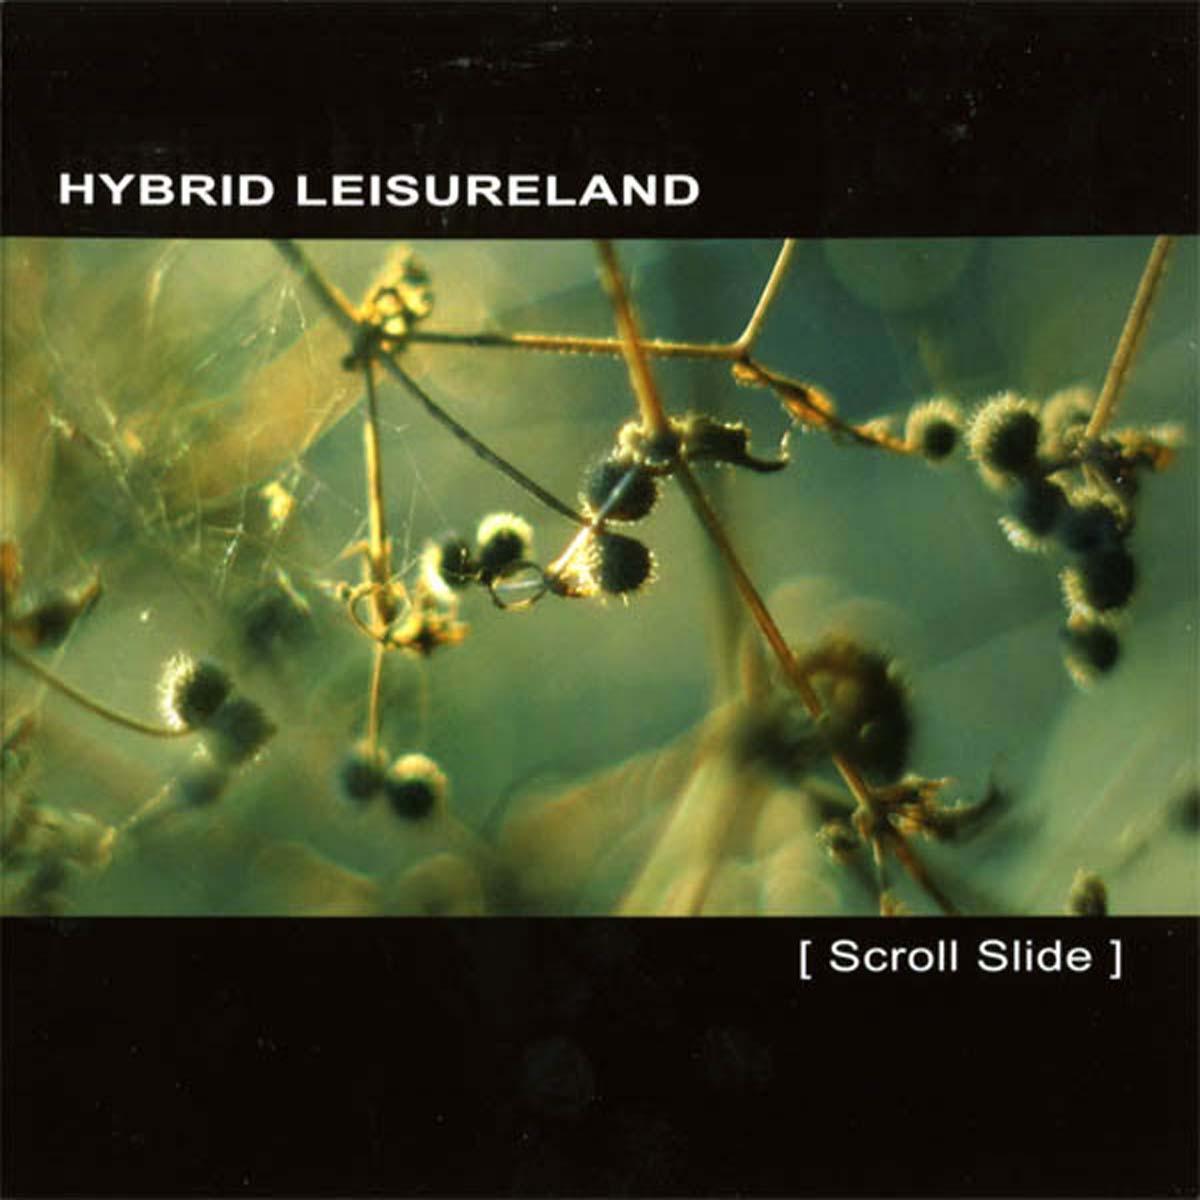 hybrid leisureland scroll slide CD